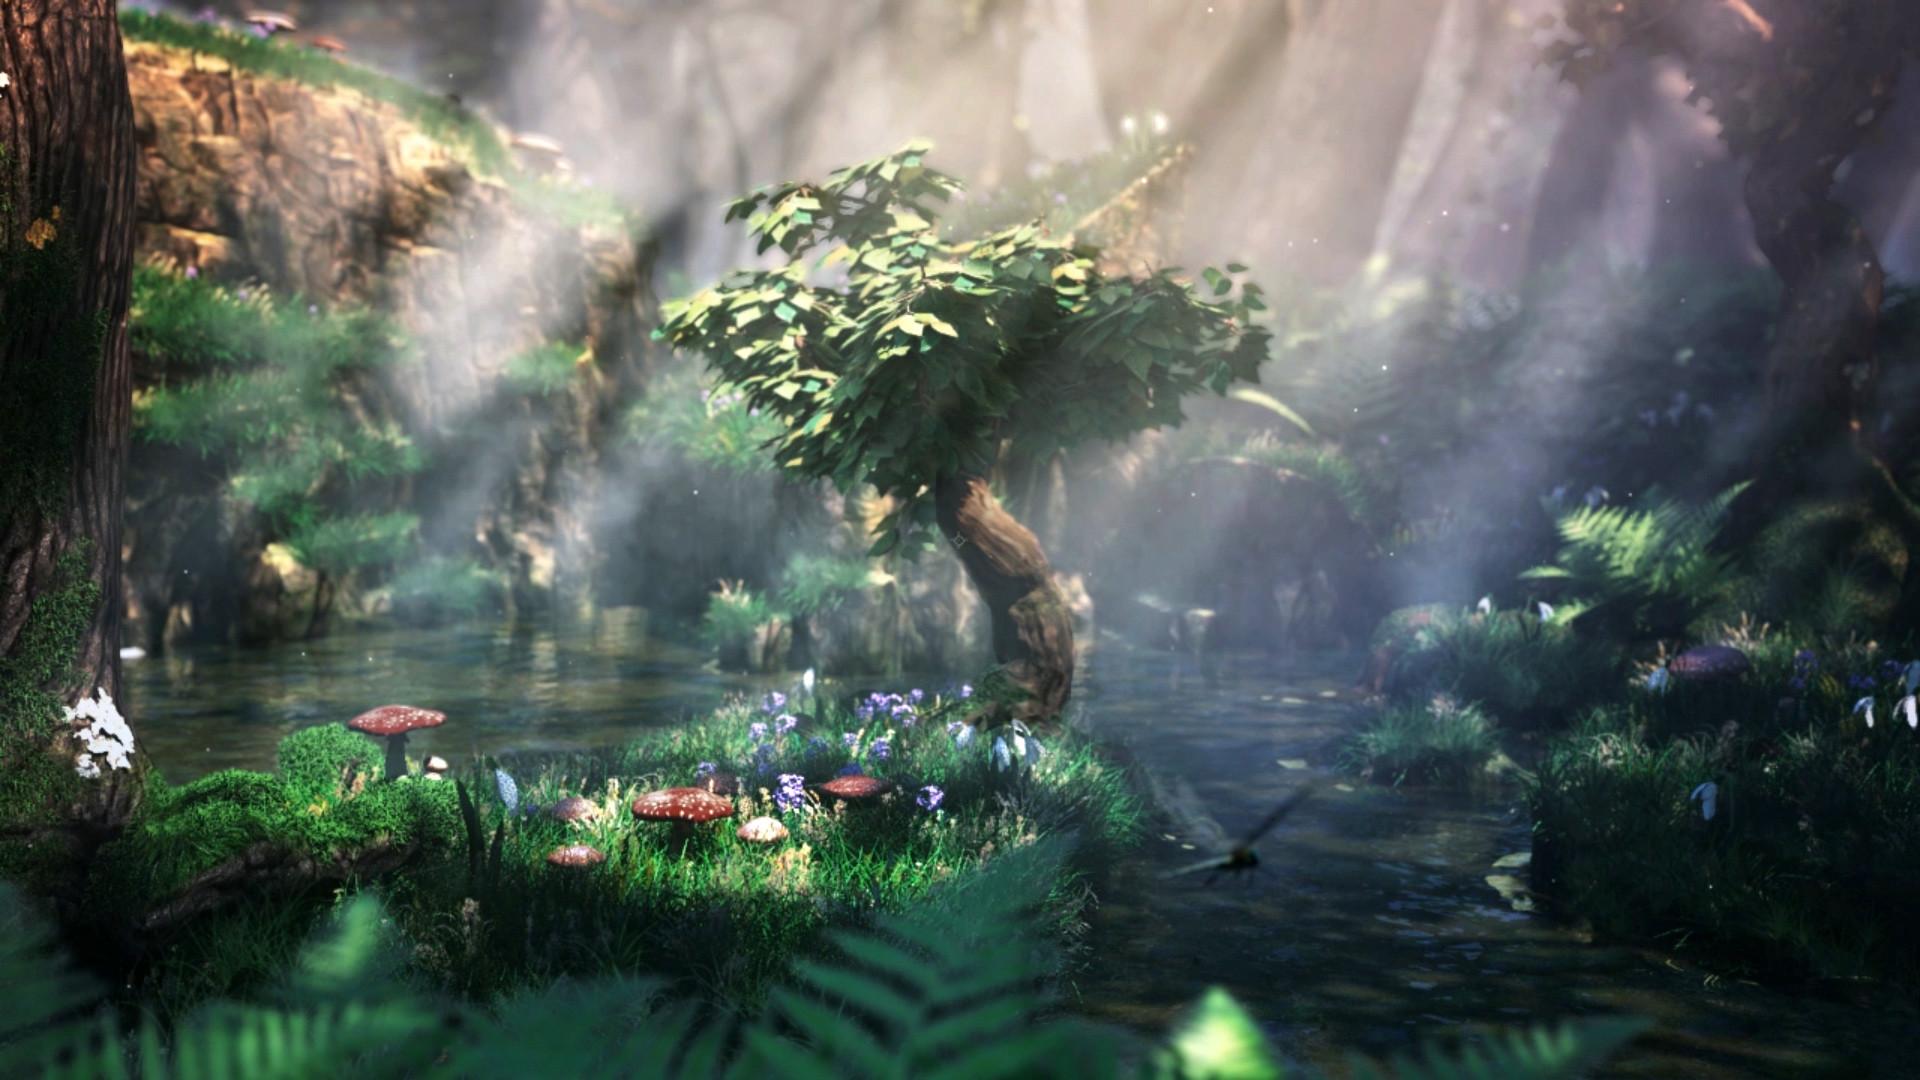 Thomas veyrat sleeping forest103